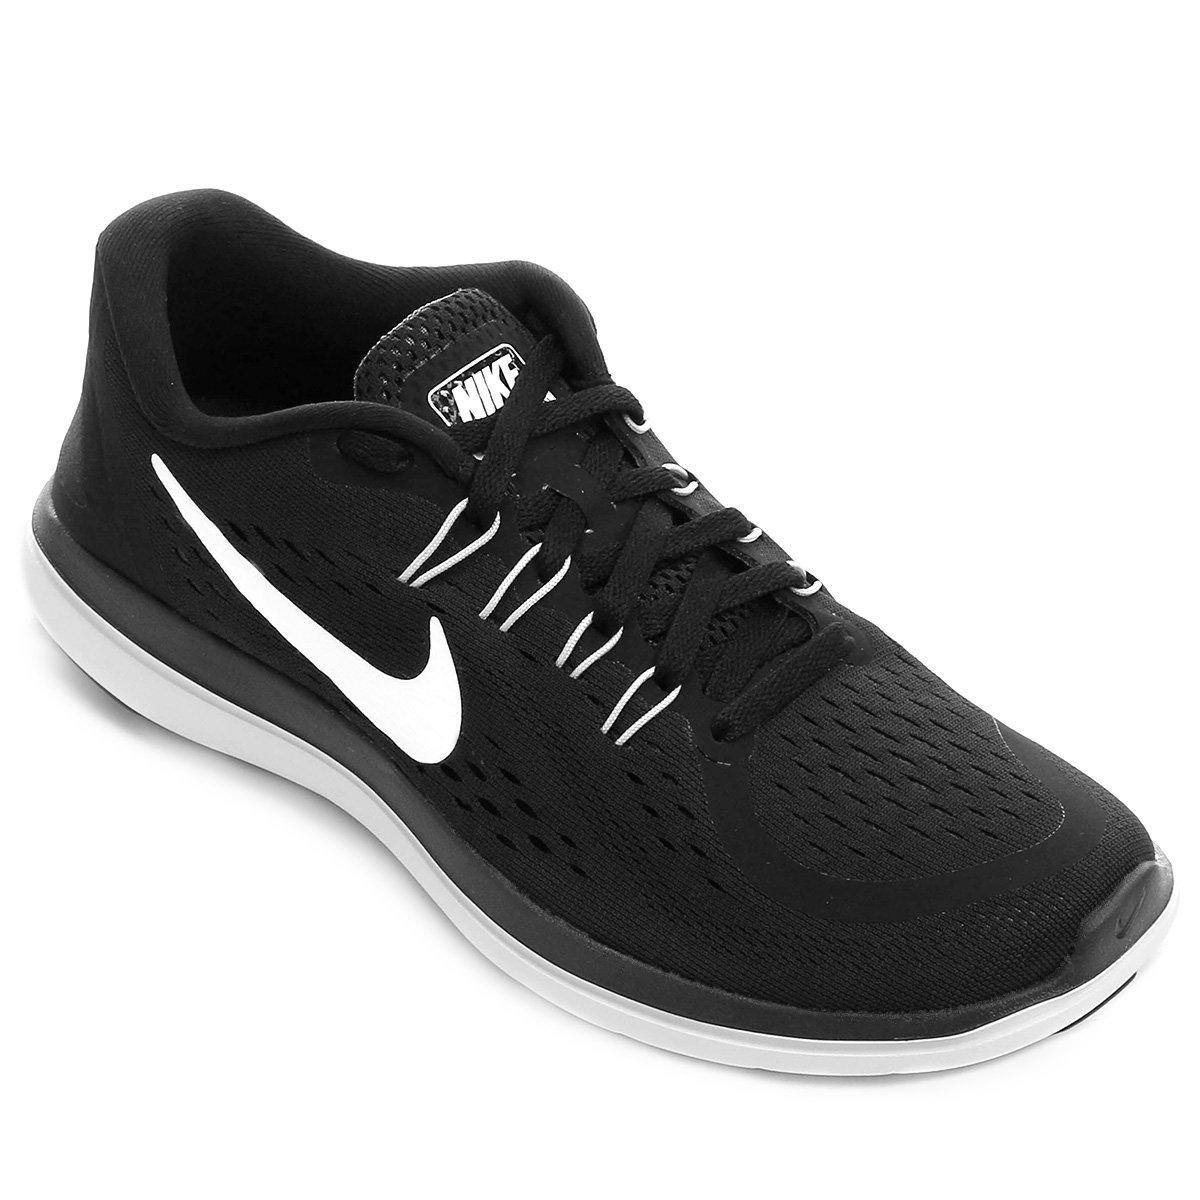 ff5abaa54e0 Tênis Nike Flex 2017 RN Feminino - Preto e Branco - Compre Agora ...